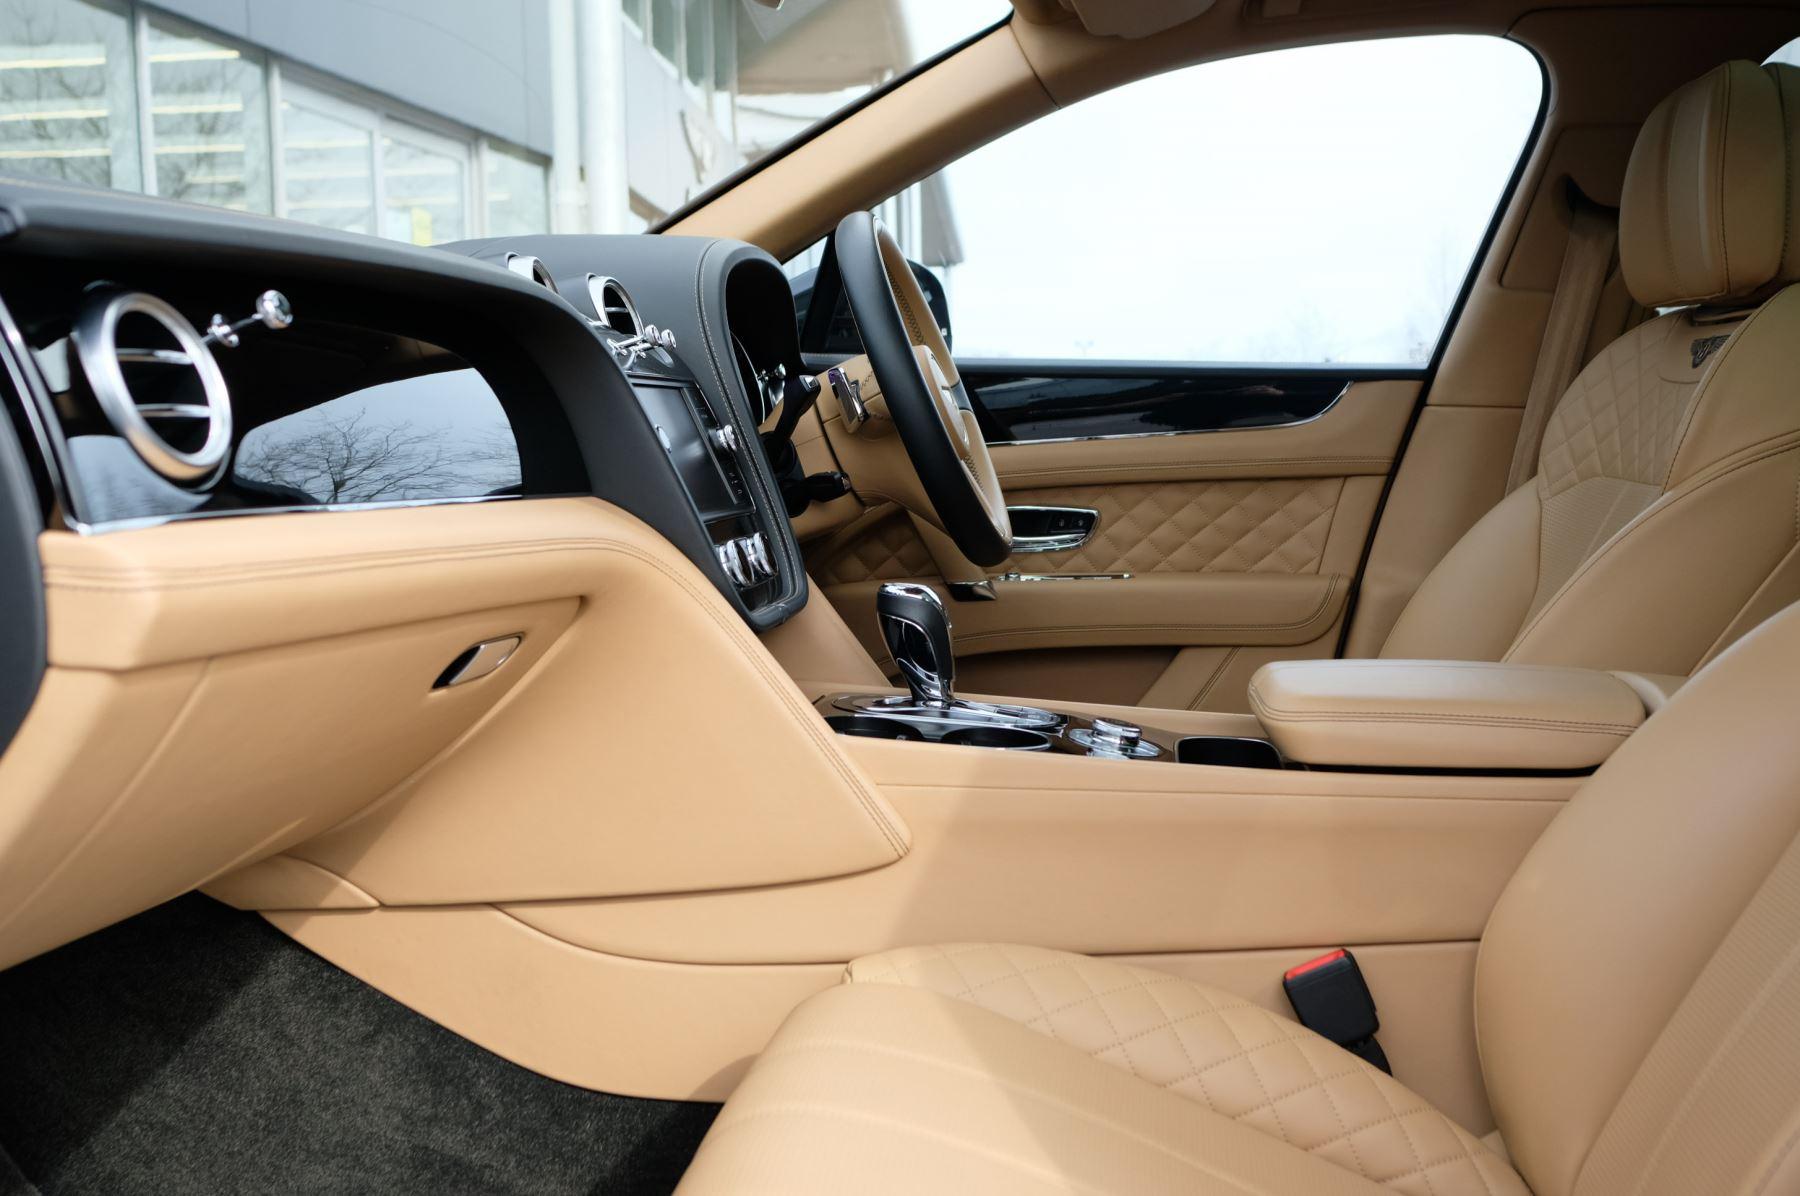 Bentley Bentayga 6.0 W12 5dr - Mulliner Driving Specification  image 17